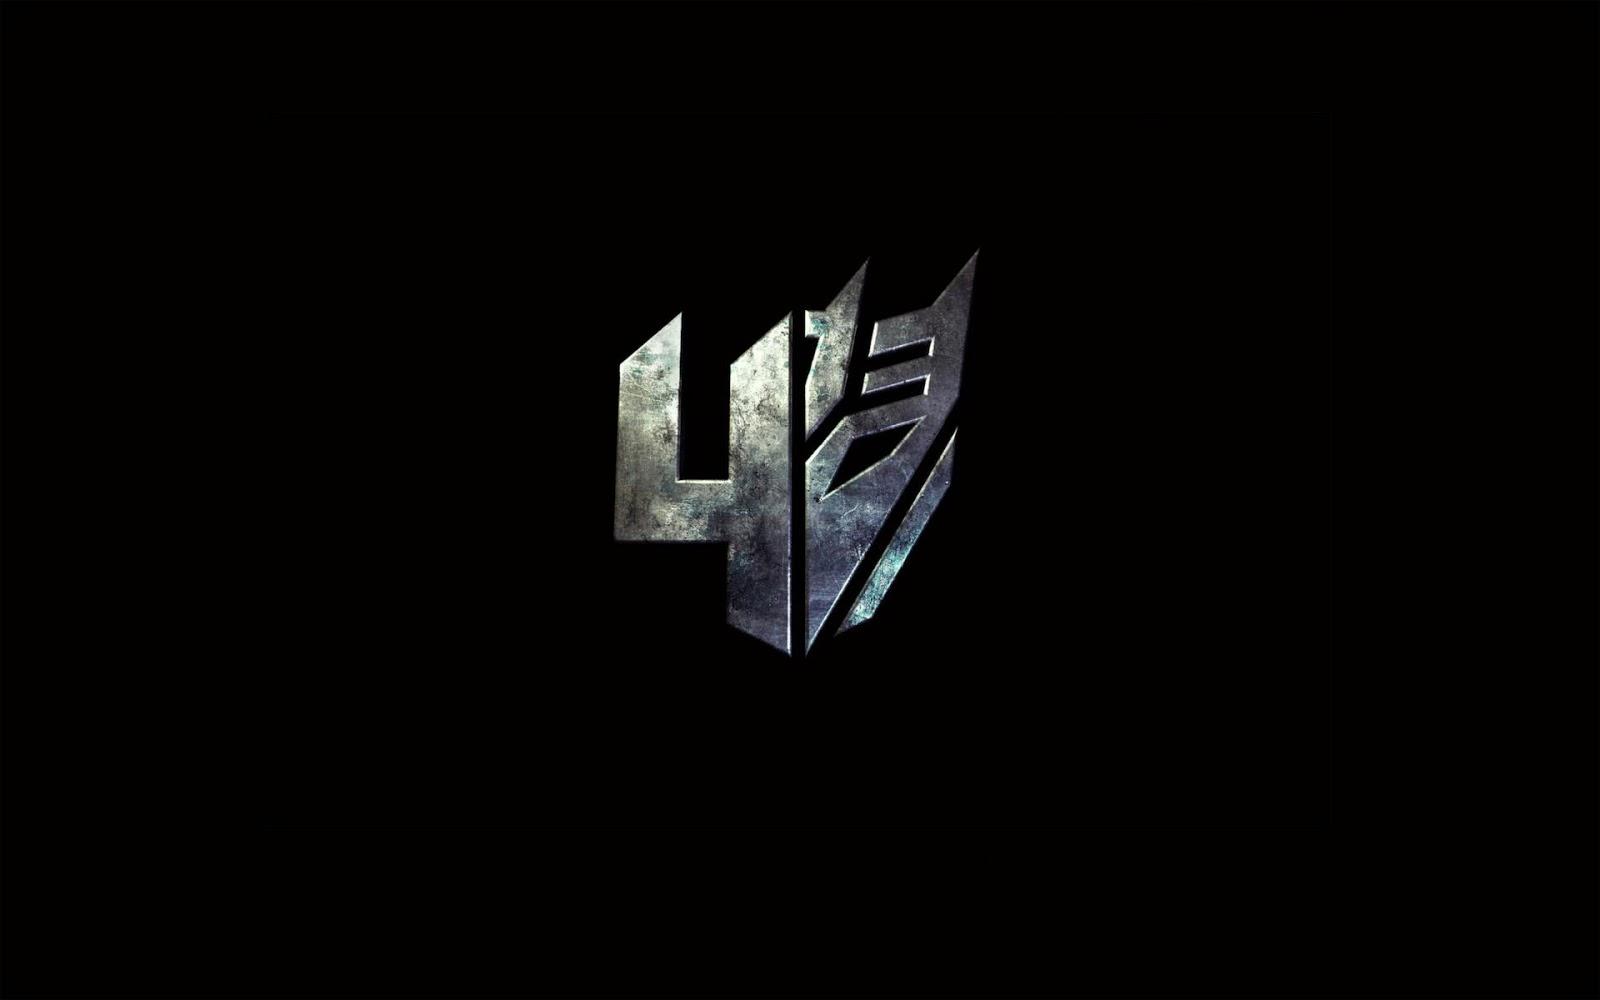 Decepticon Transformers 4 Age of Extinction 6o Wallpaper HD